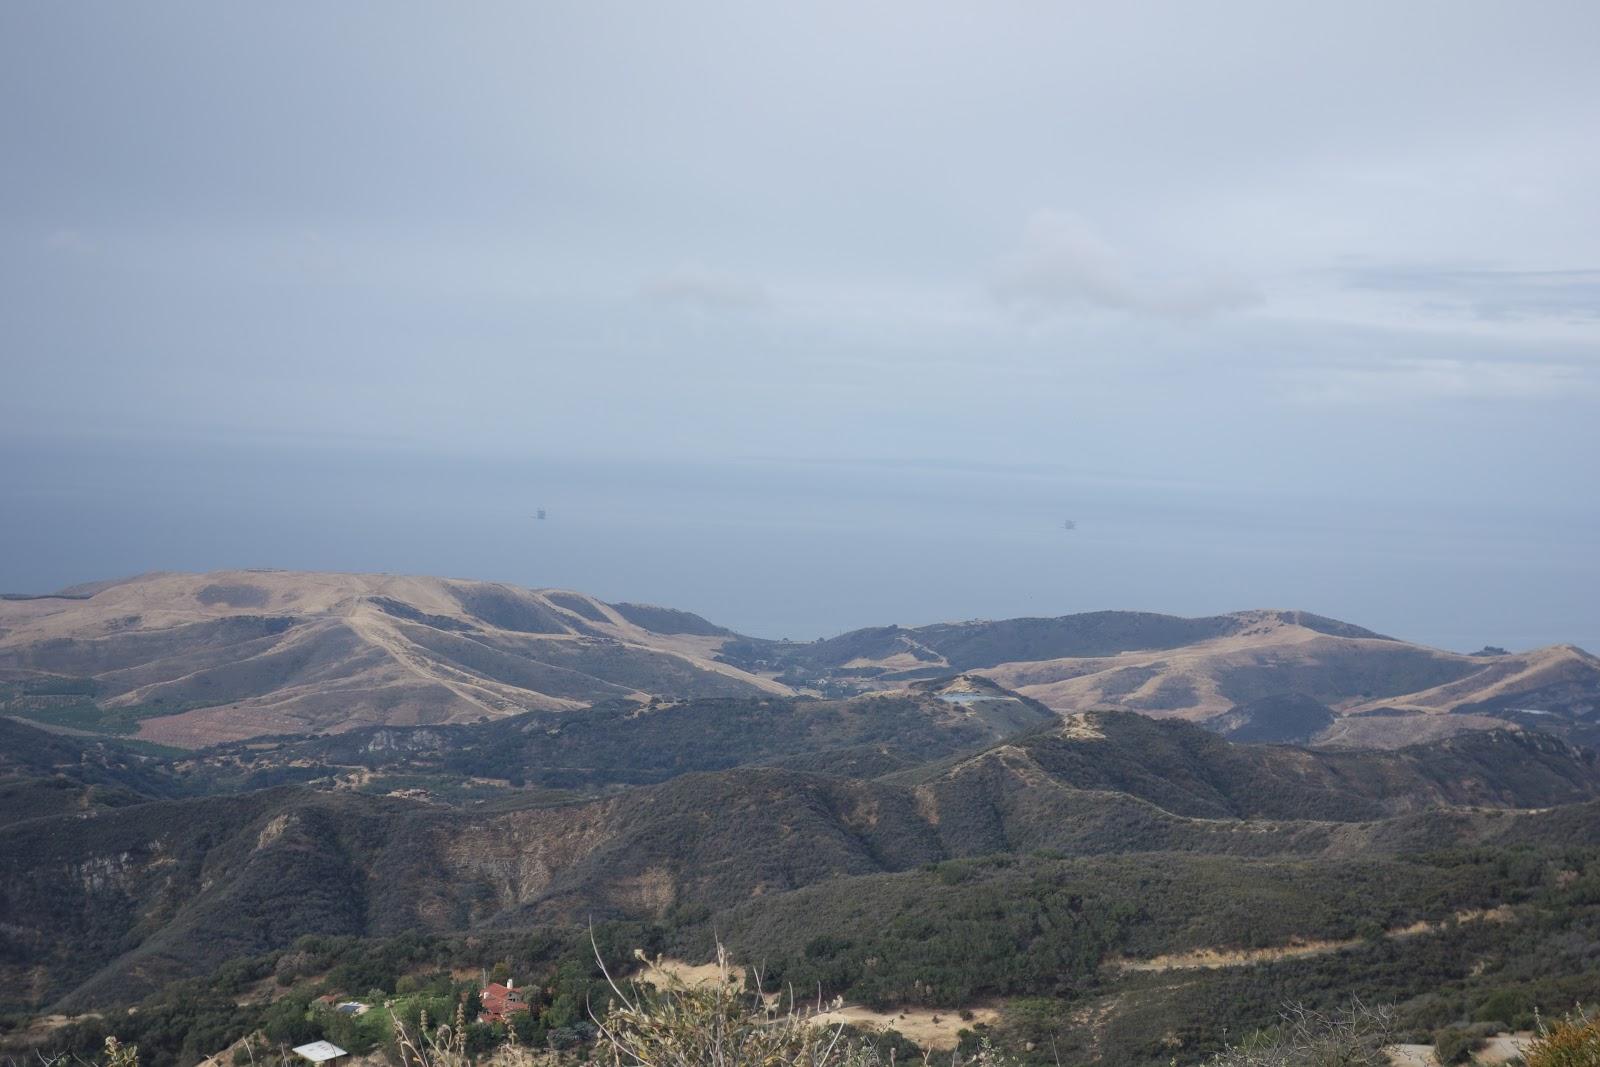 Cycling Refugio Bike Climb - W. Camino Cielo - views from ridge on Camino Cielo - Pacific Ocean